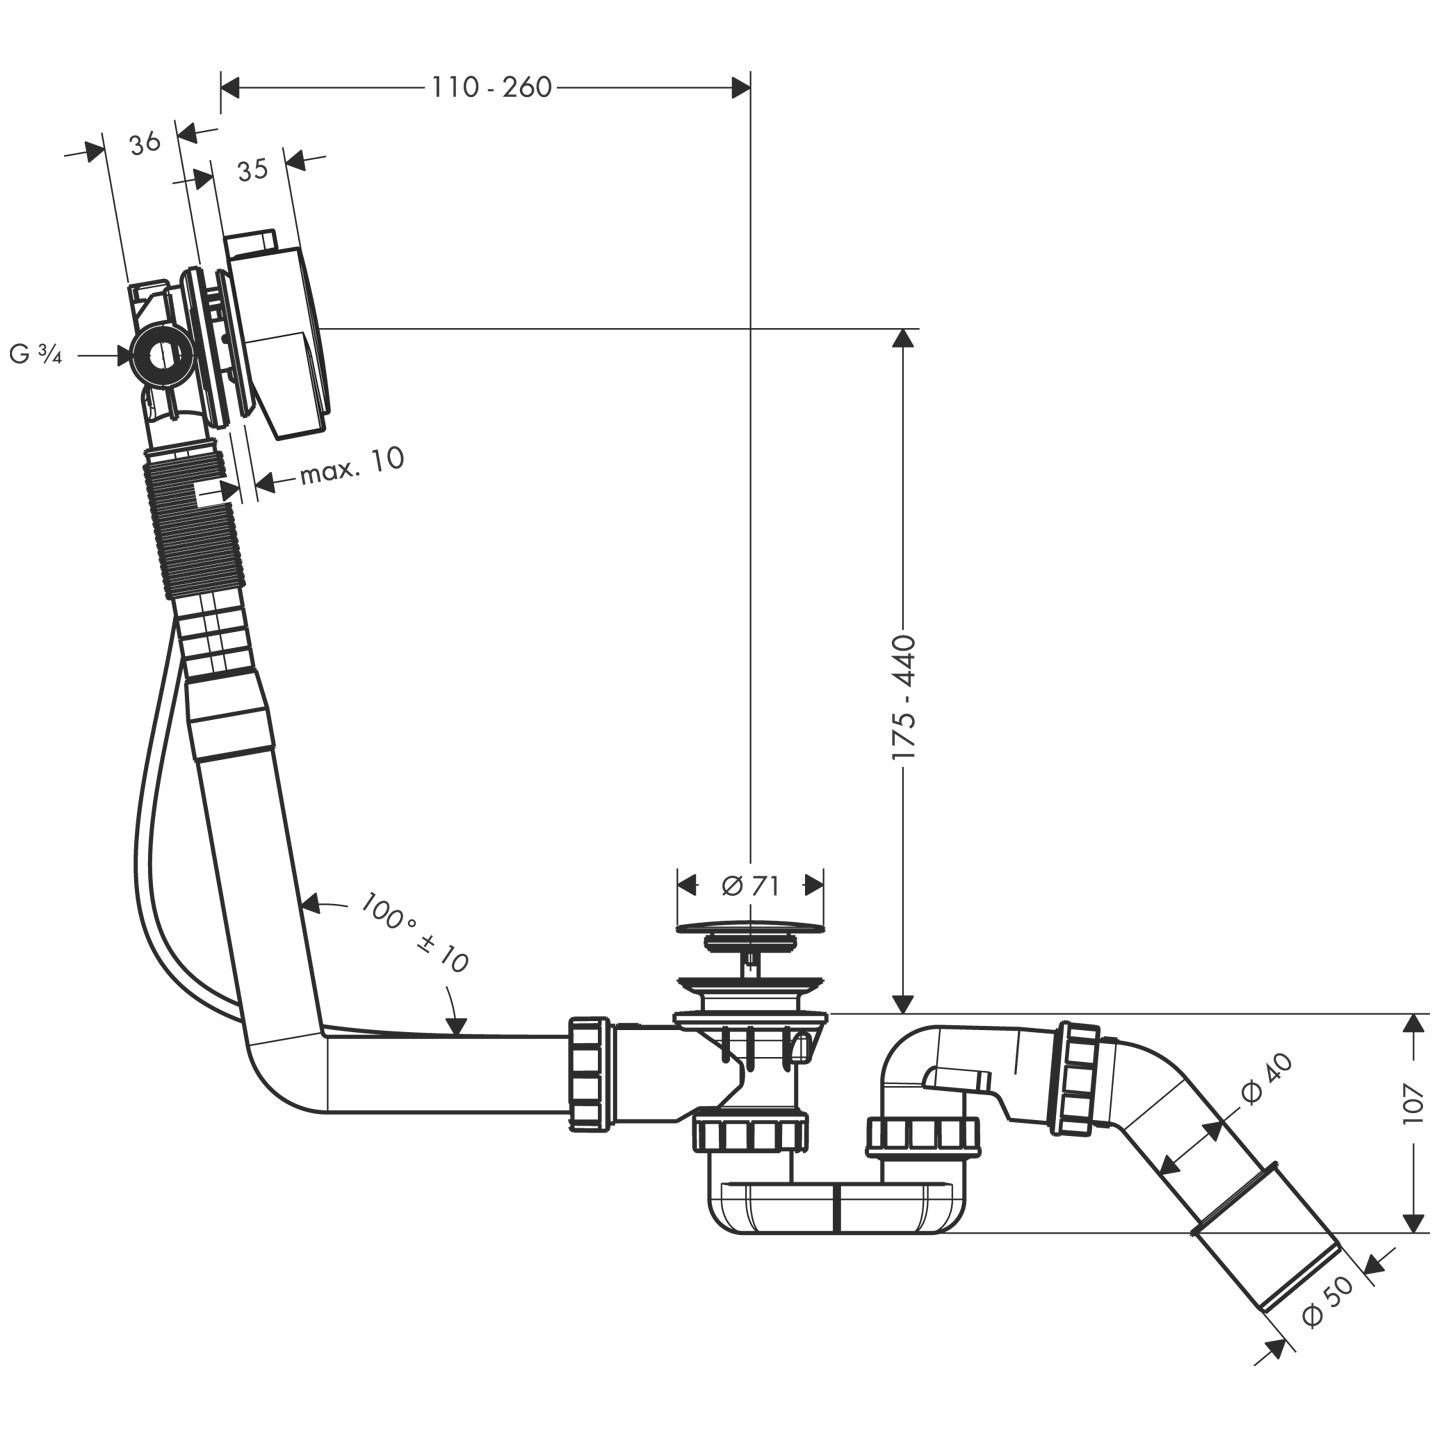 58113000 Exafill S Complete set bath filler, waste and overflow set for standard bathtubs